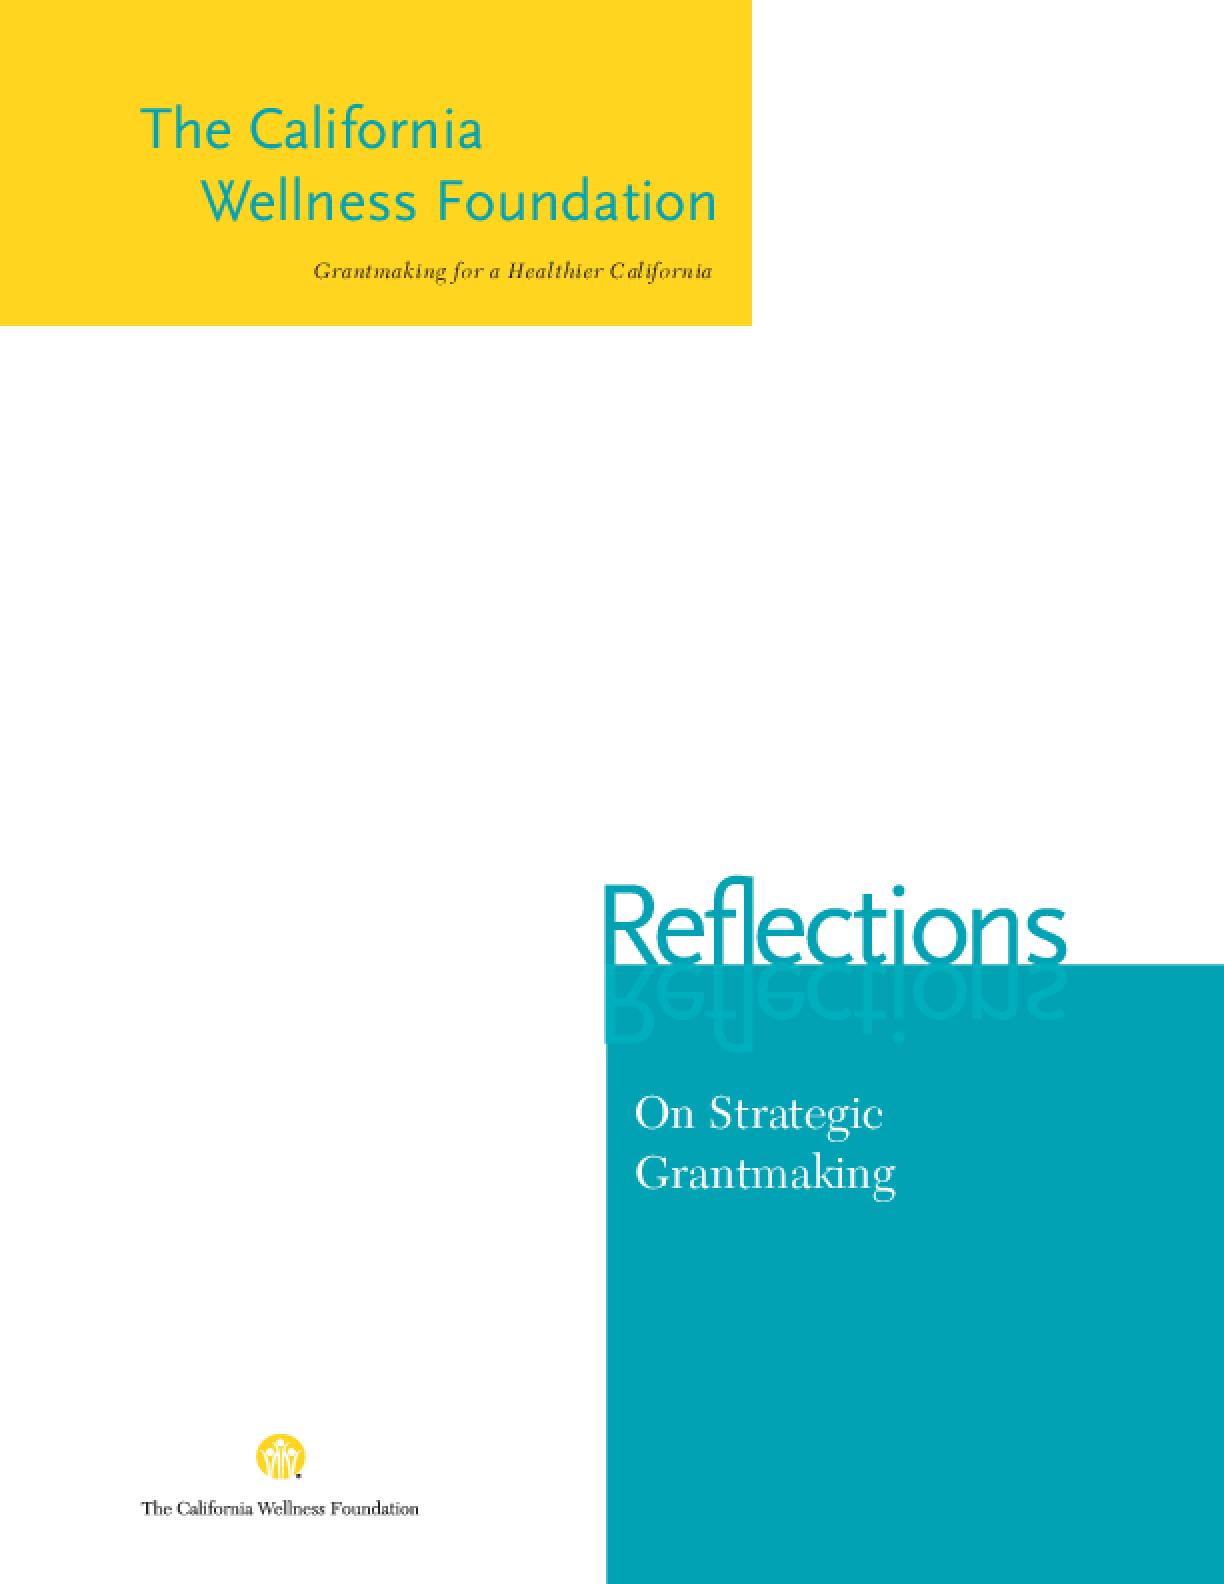 Reflections on Strategic Grantmaking